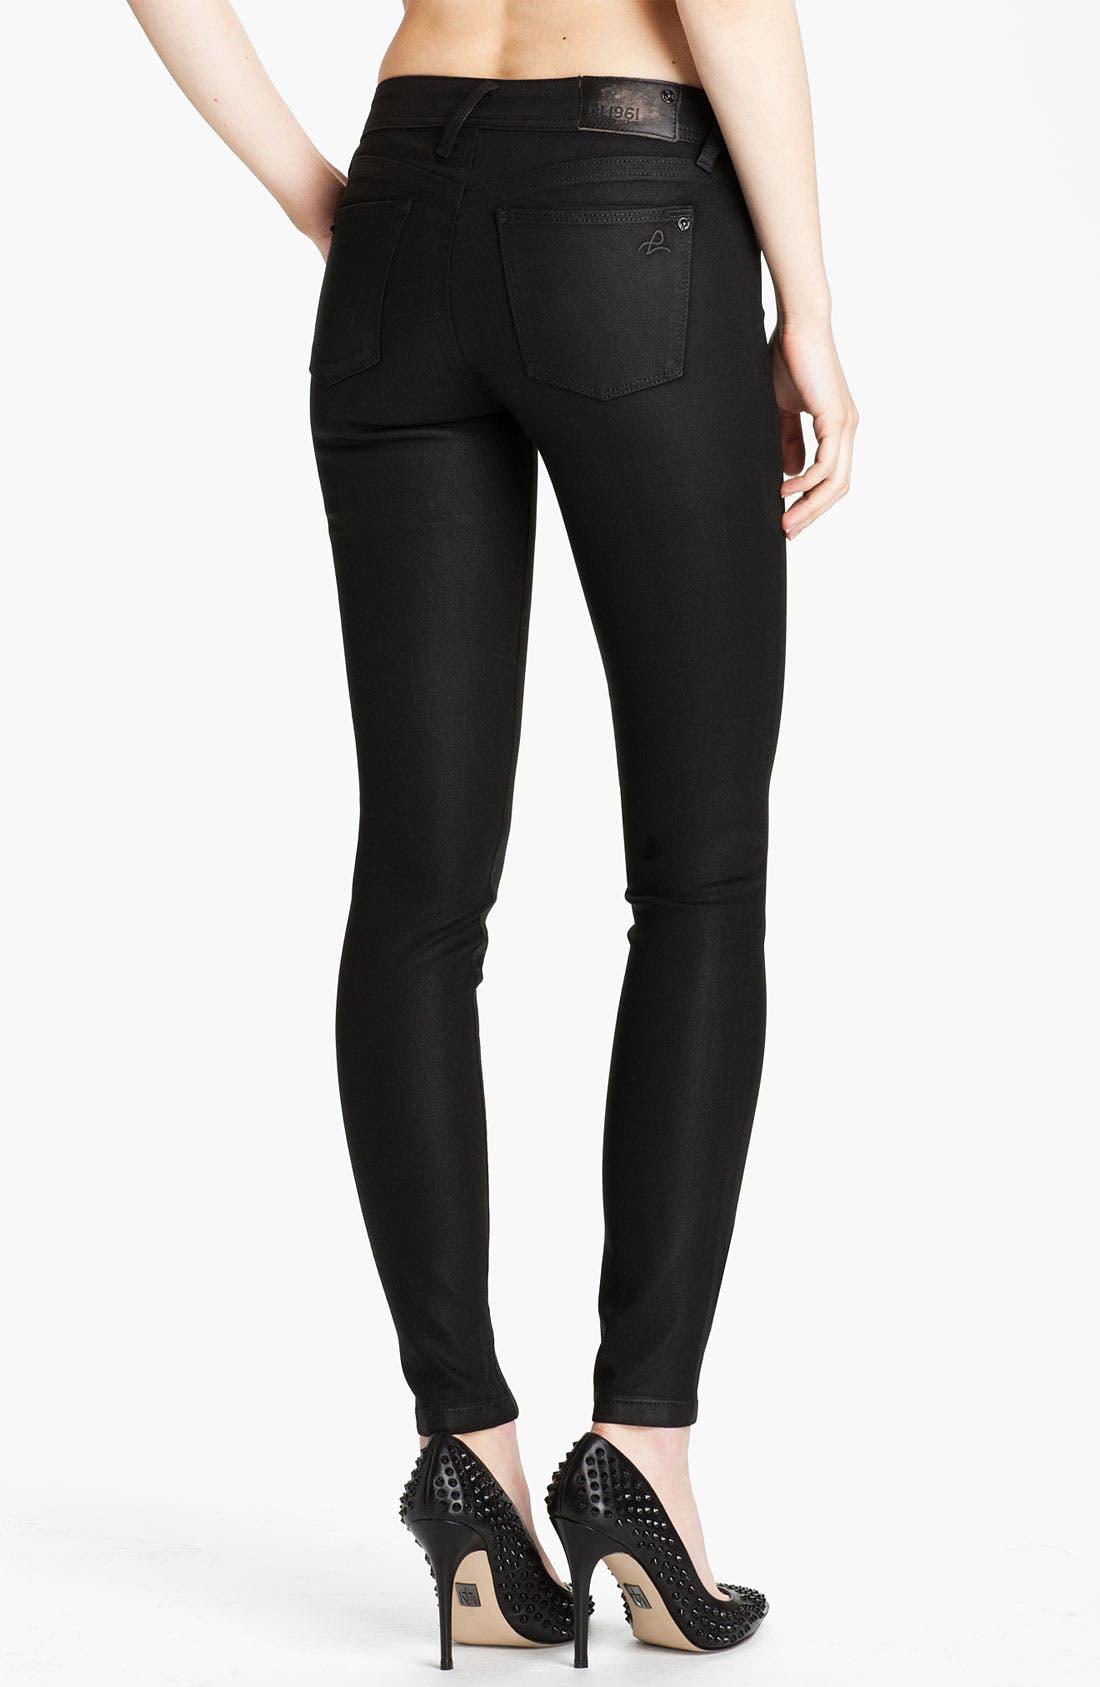 Alternate Image 2  - DL1961 'Amanda' Coated Denim Skinny Jeans (Hematite)